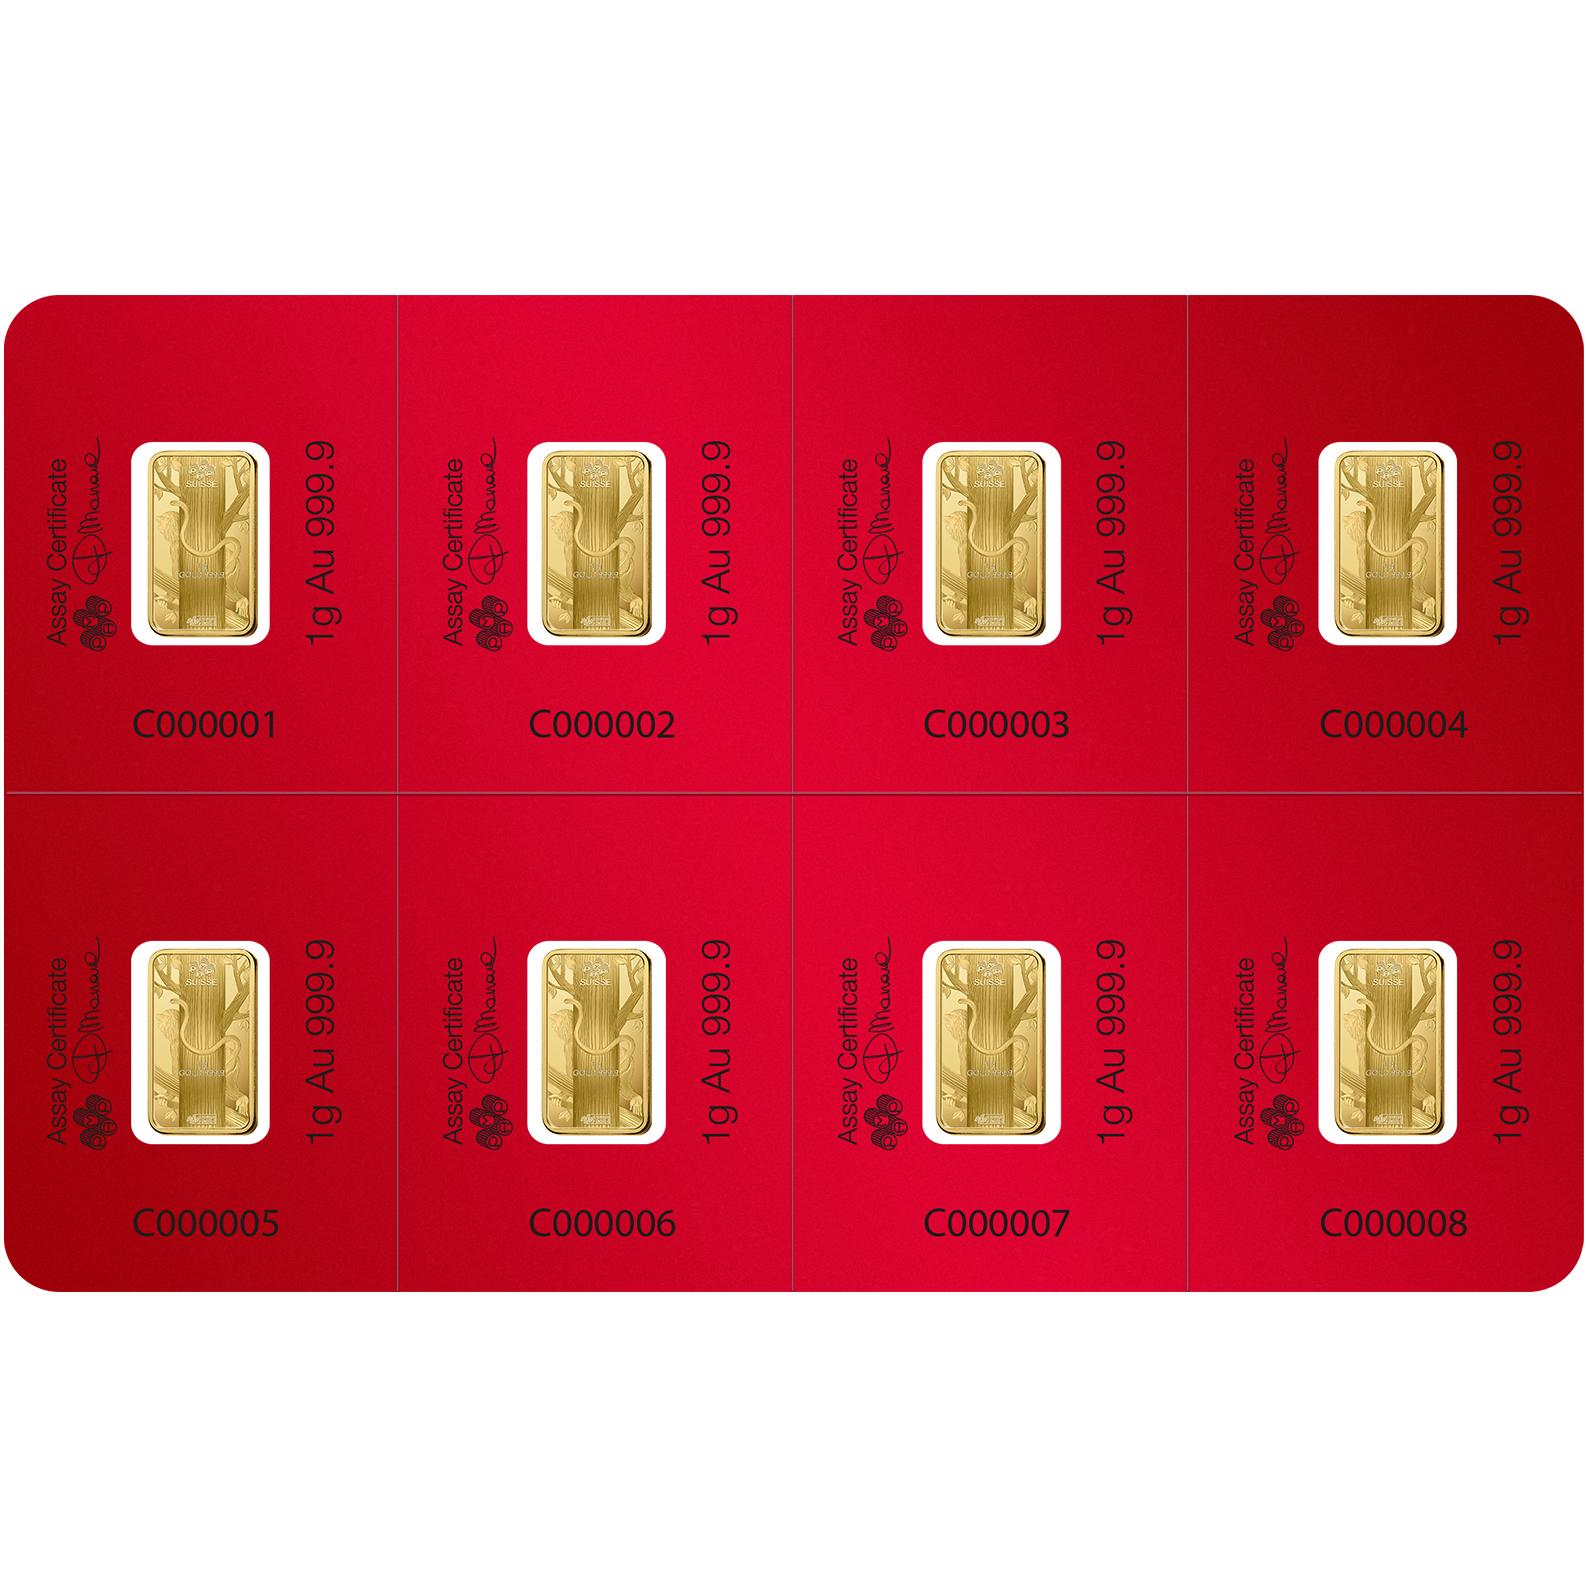 8x1 gram multigram Gold Bar - PAMP Suisse Lunar Monkey